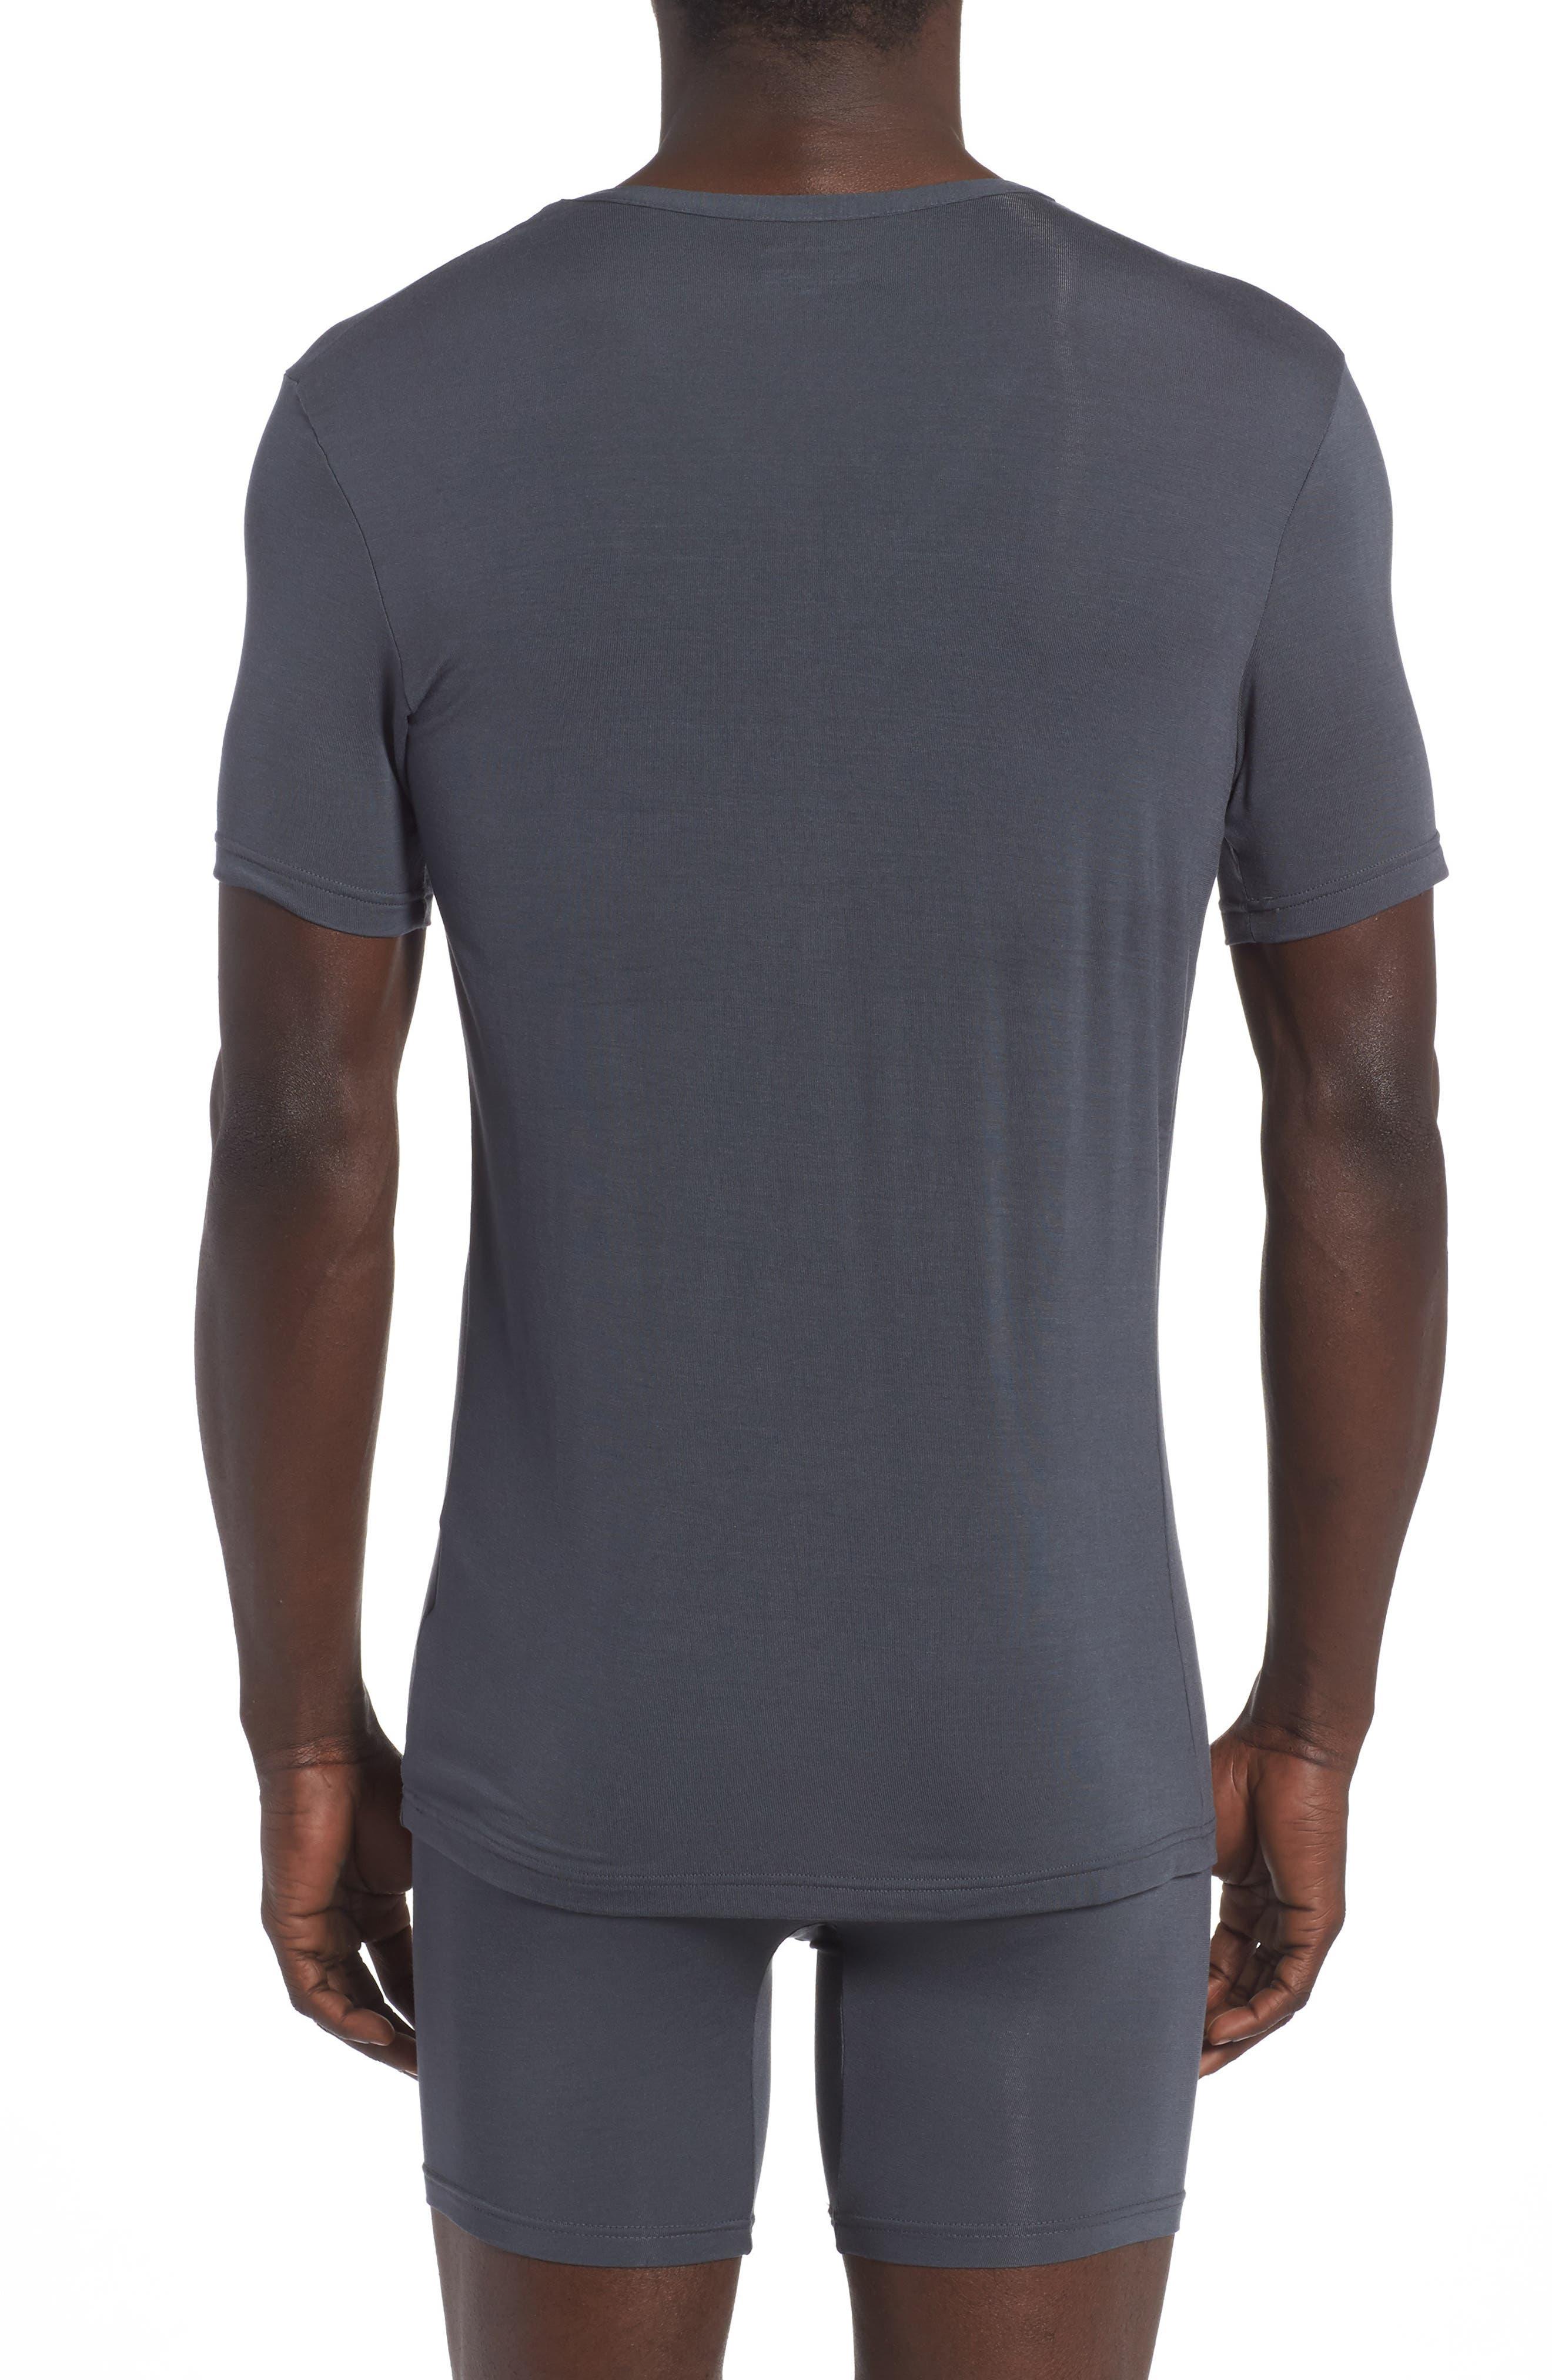 'U5563' V-Neck Micromodal T-Shirt,                             Alternate thumbnail 2, color,                             MINK